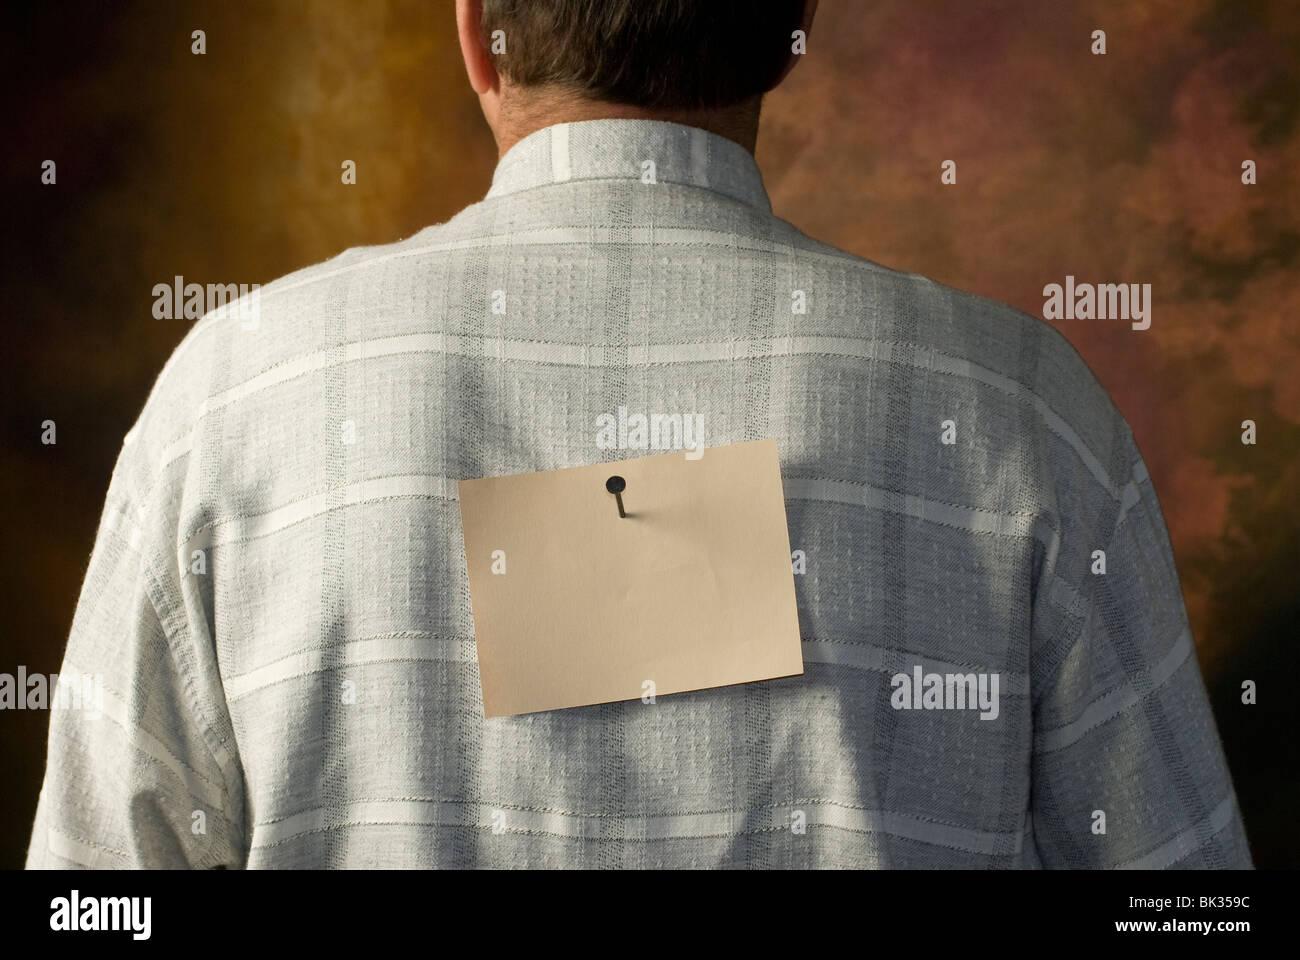 Nota clavado a la espalda del hombre. Foto de stock